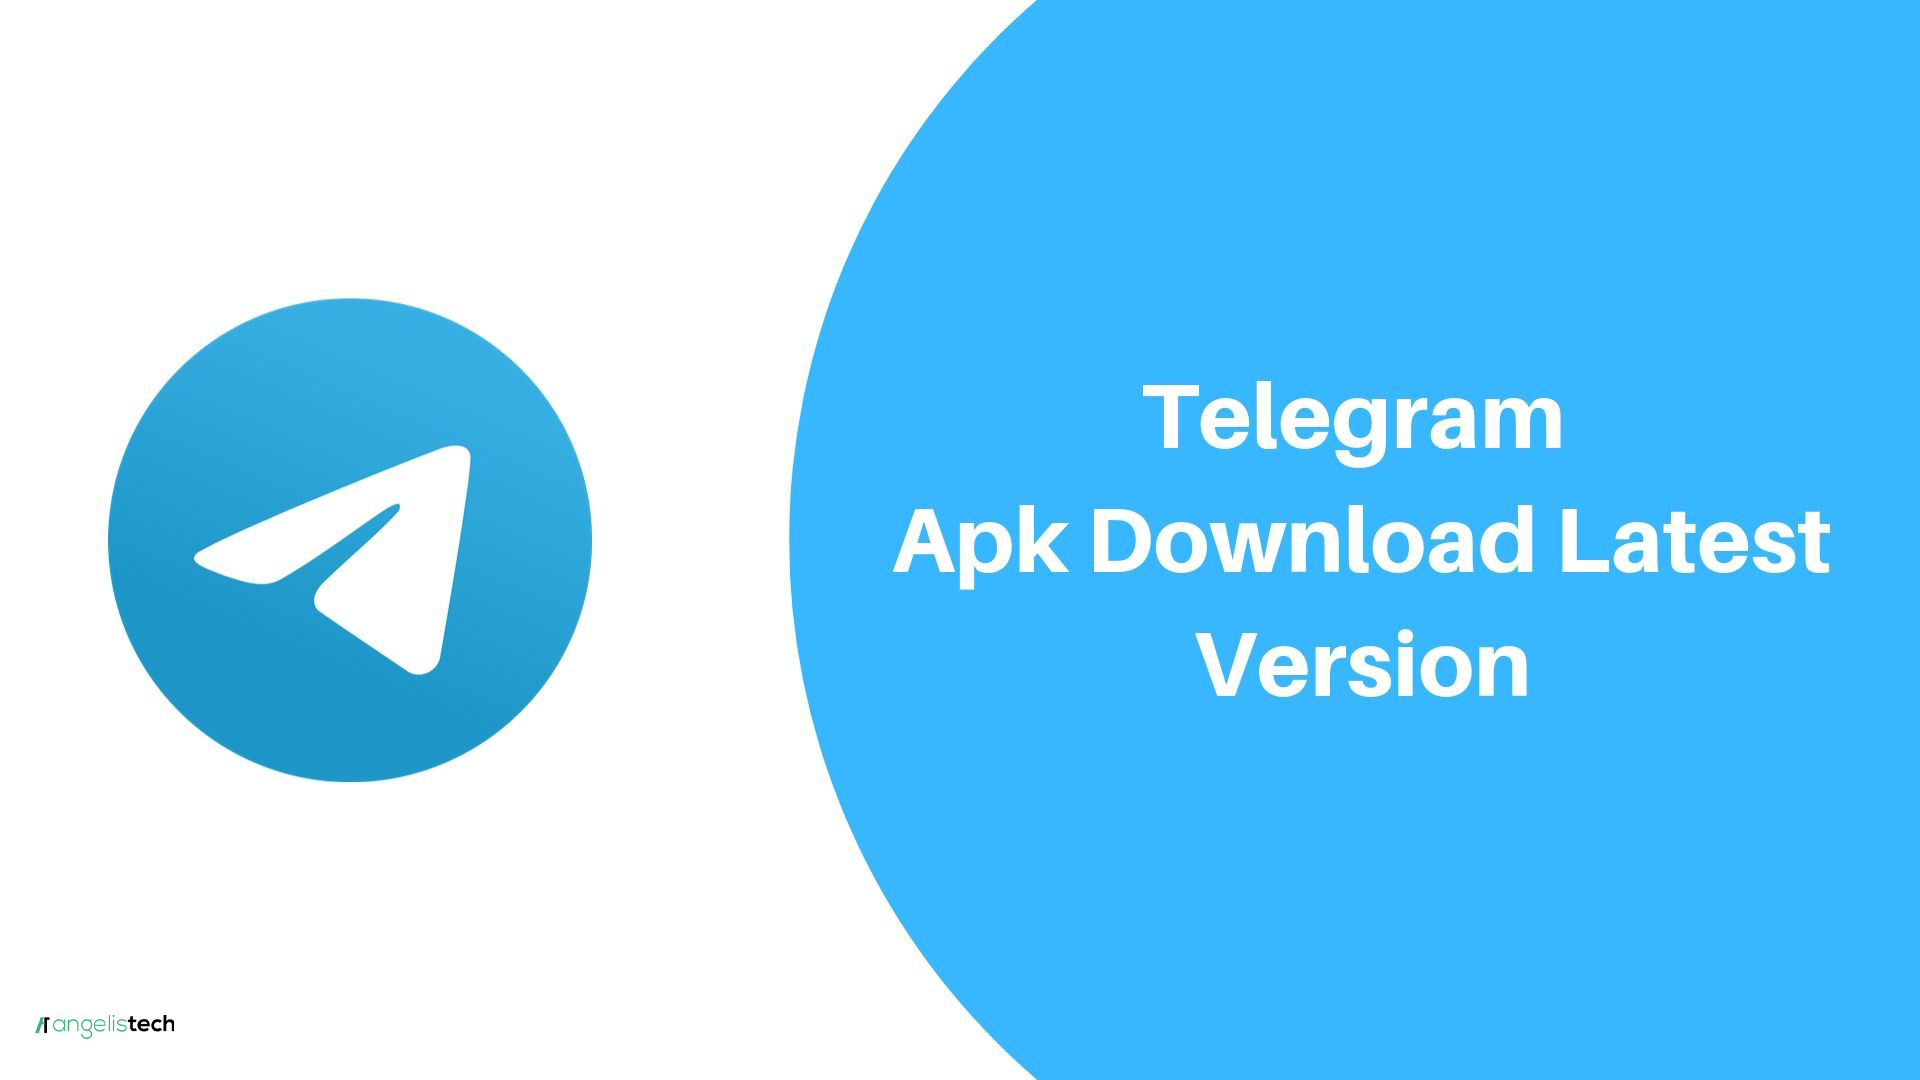 Telegram Apk Download Latest Version And Older Versions   AngelisTech